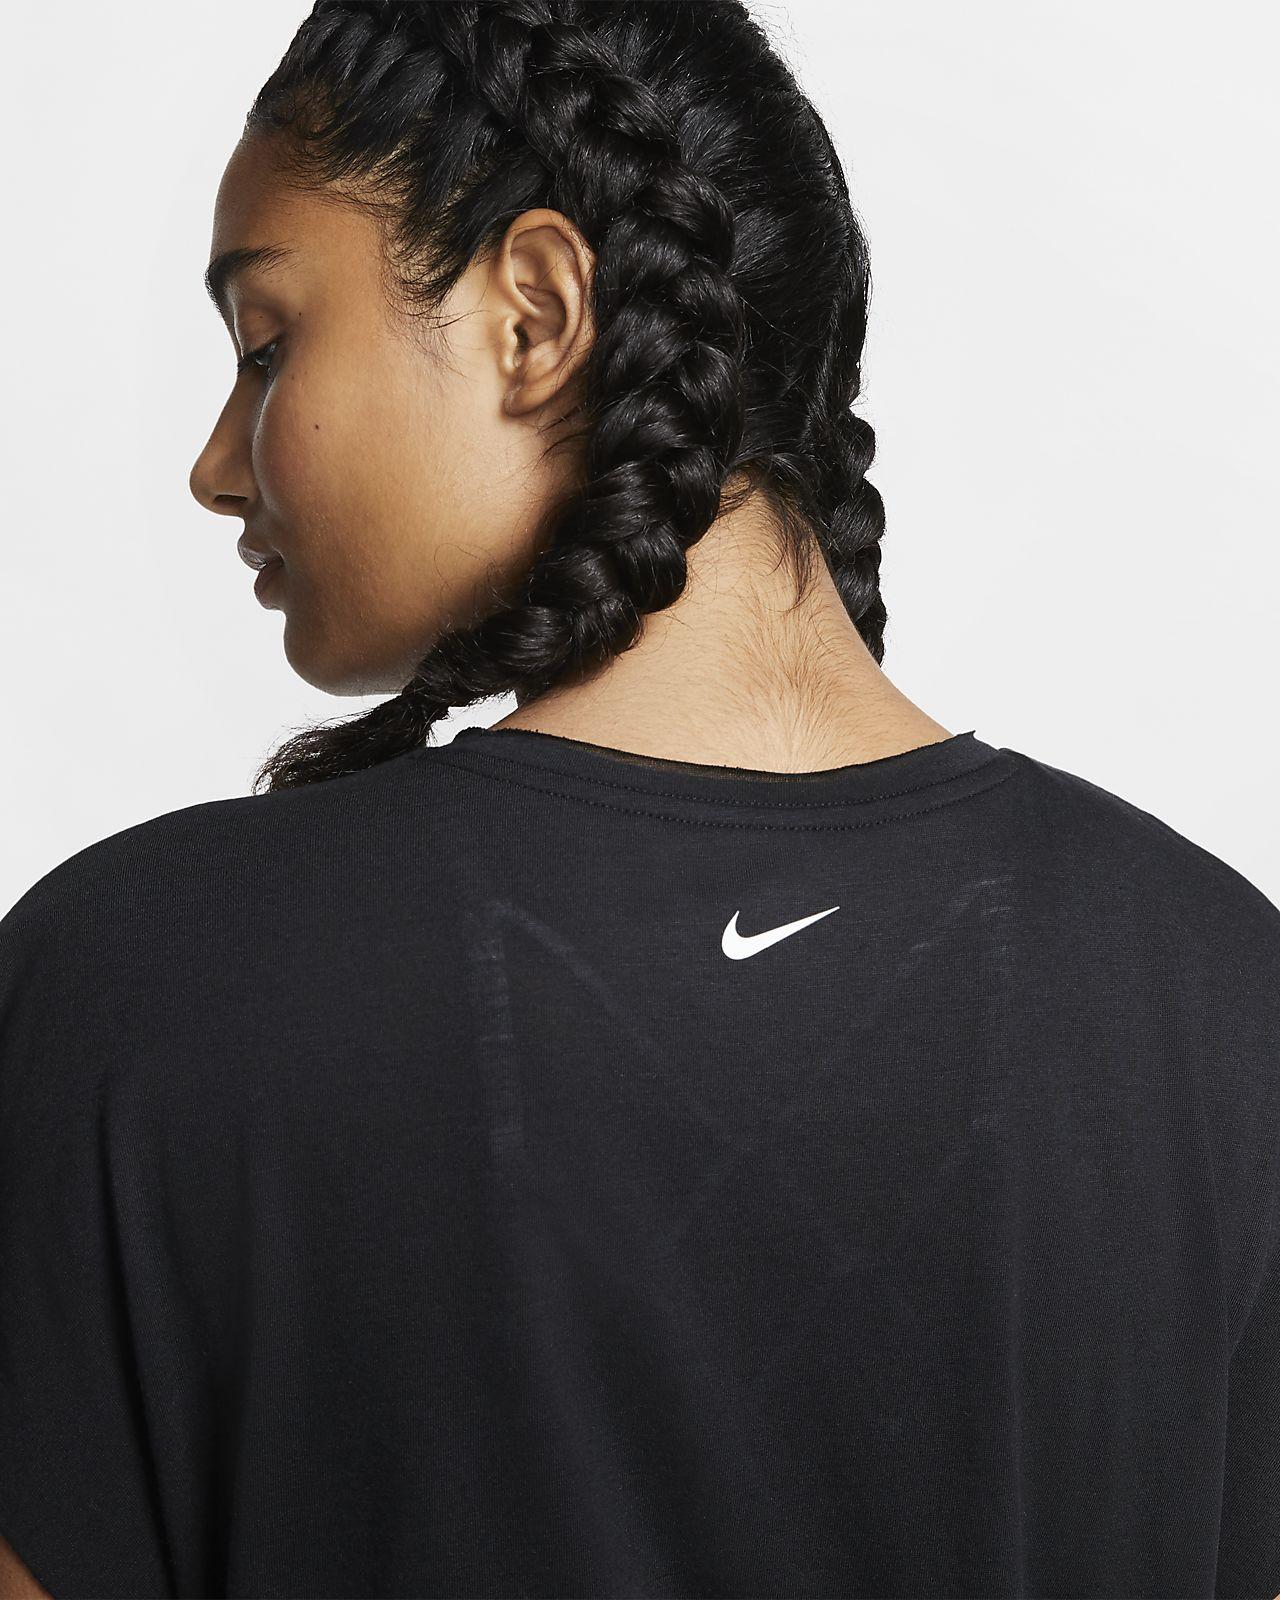 Nike Dri FIT rövid ujjú női edzőfelső